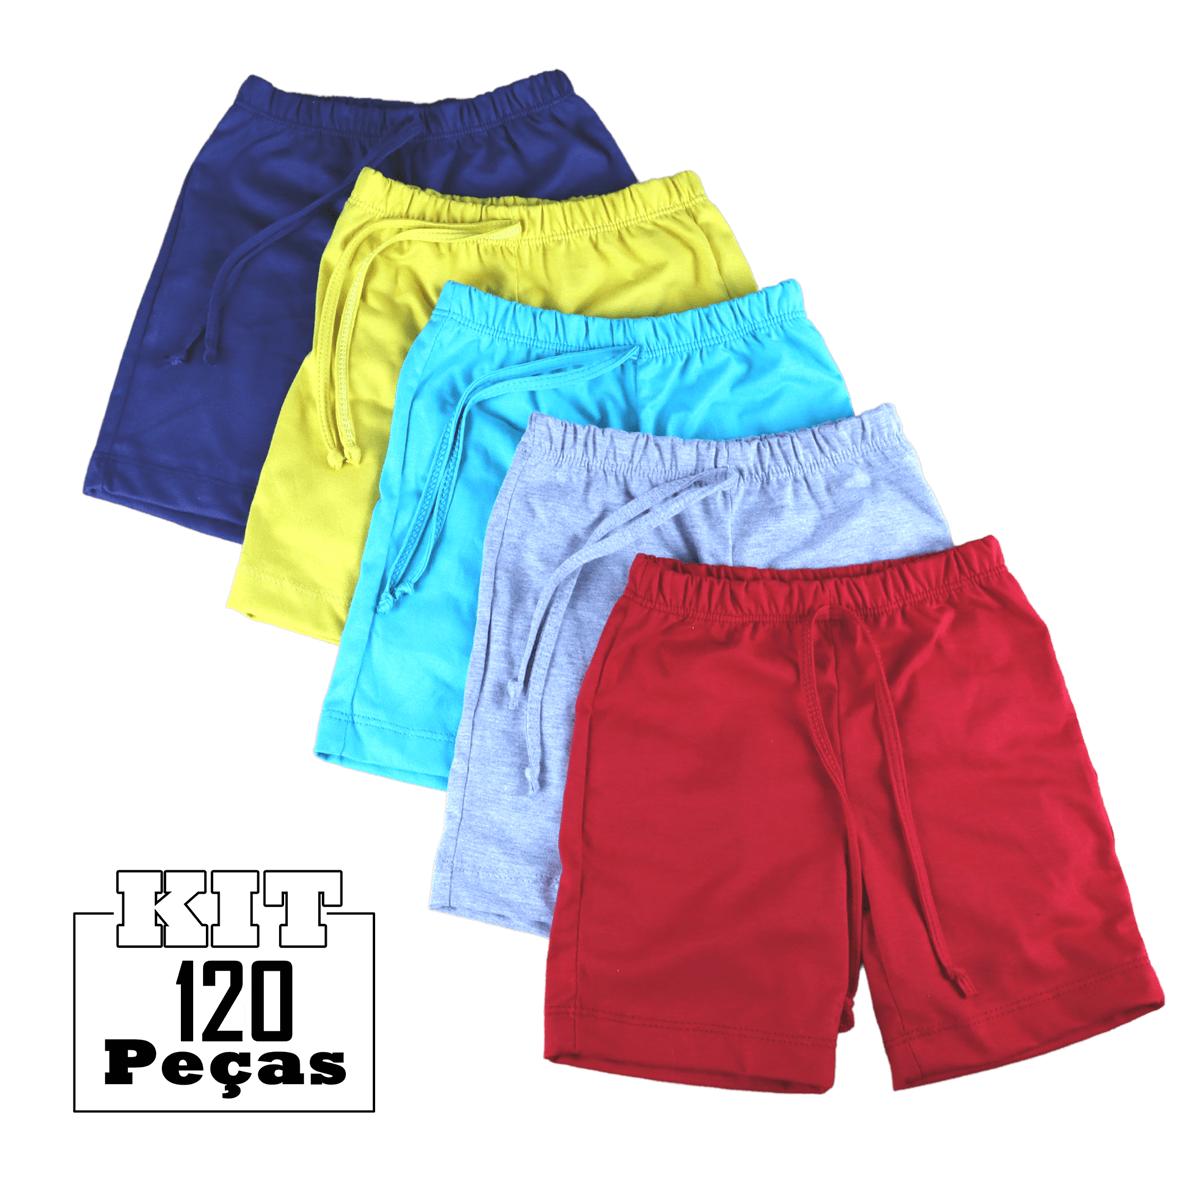 Kit 120 Shorts Bermuda Malha Bebê Menino Menina Atacado